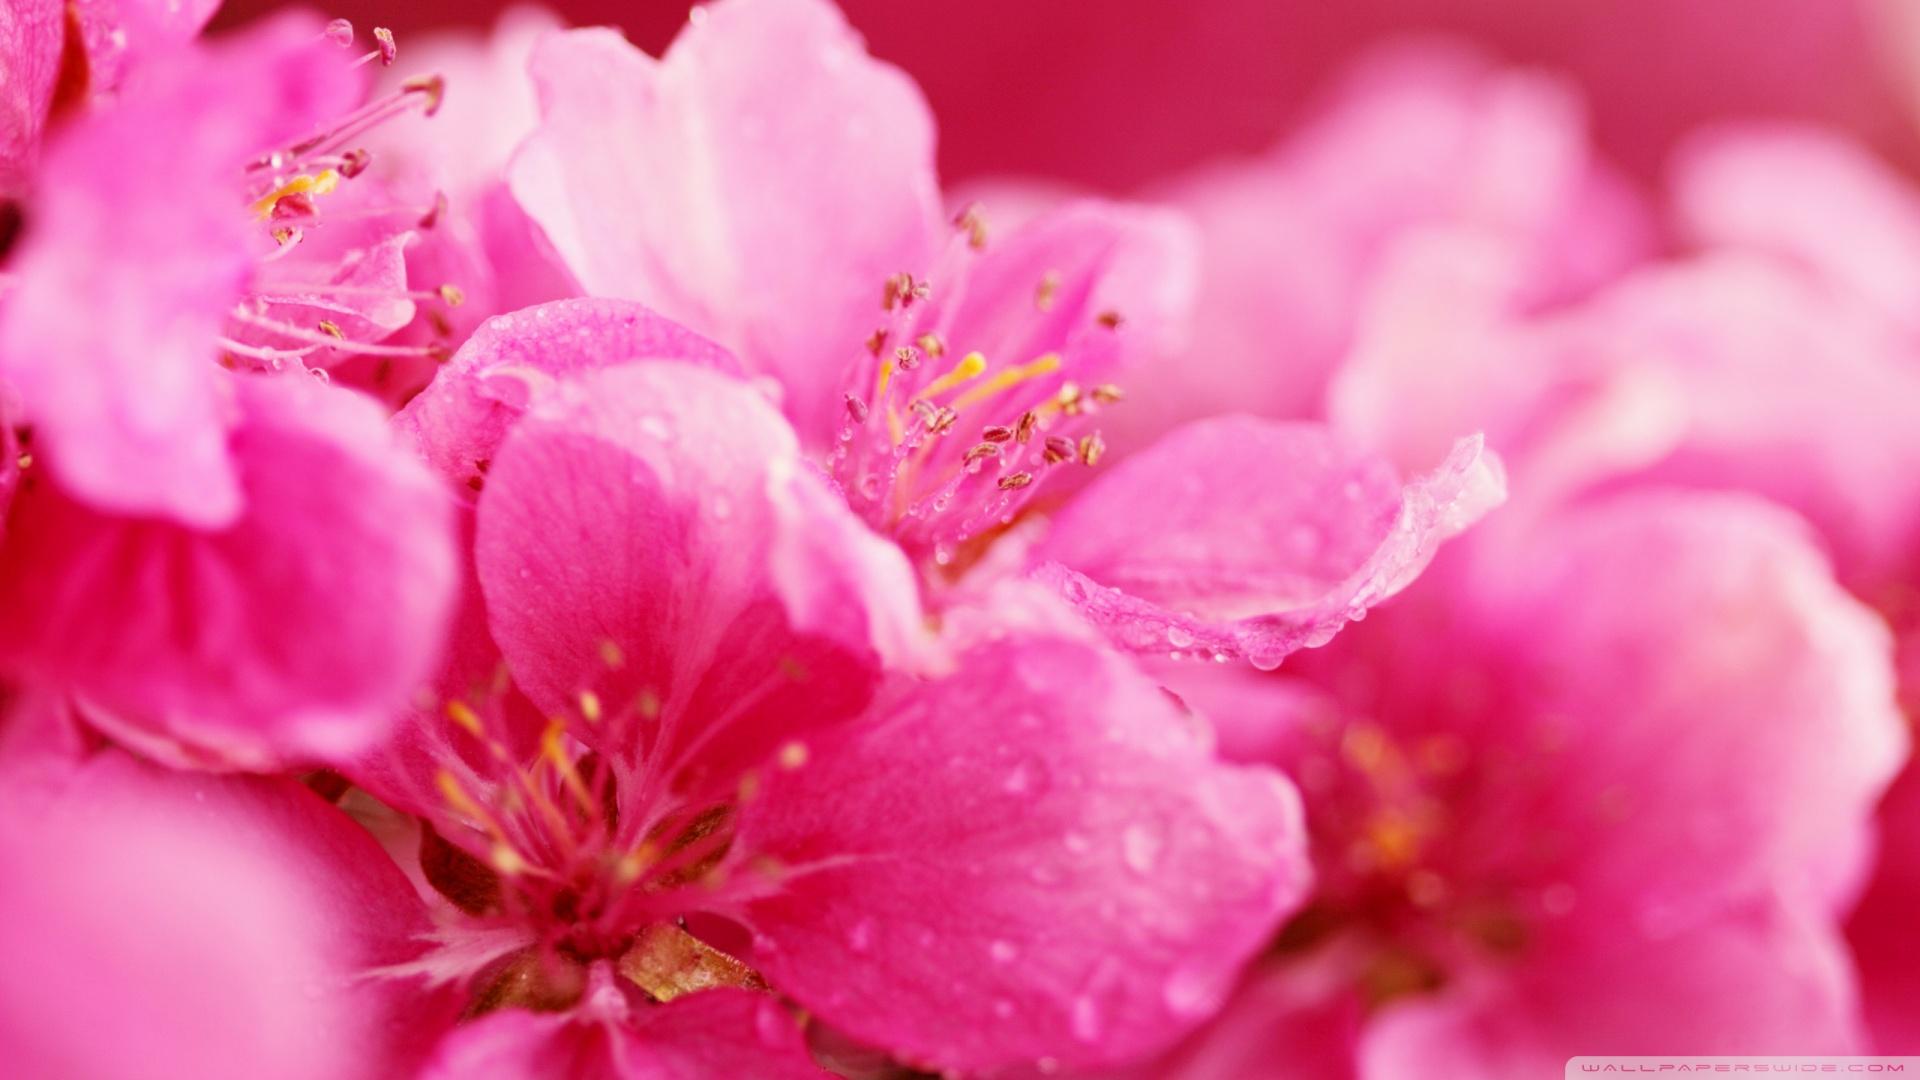 Pink Flower Desktop Wallpapers This Wallpaper 1920x1080